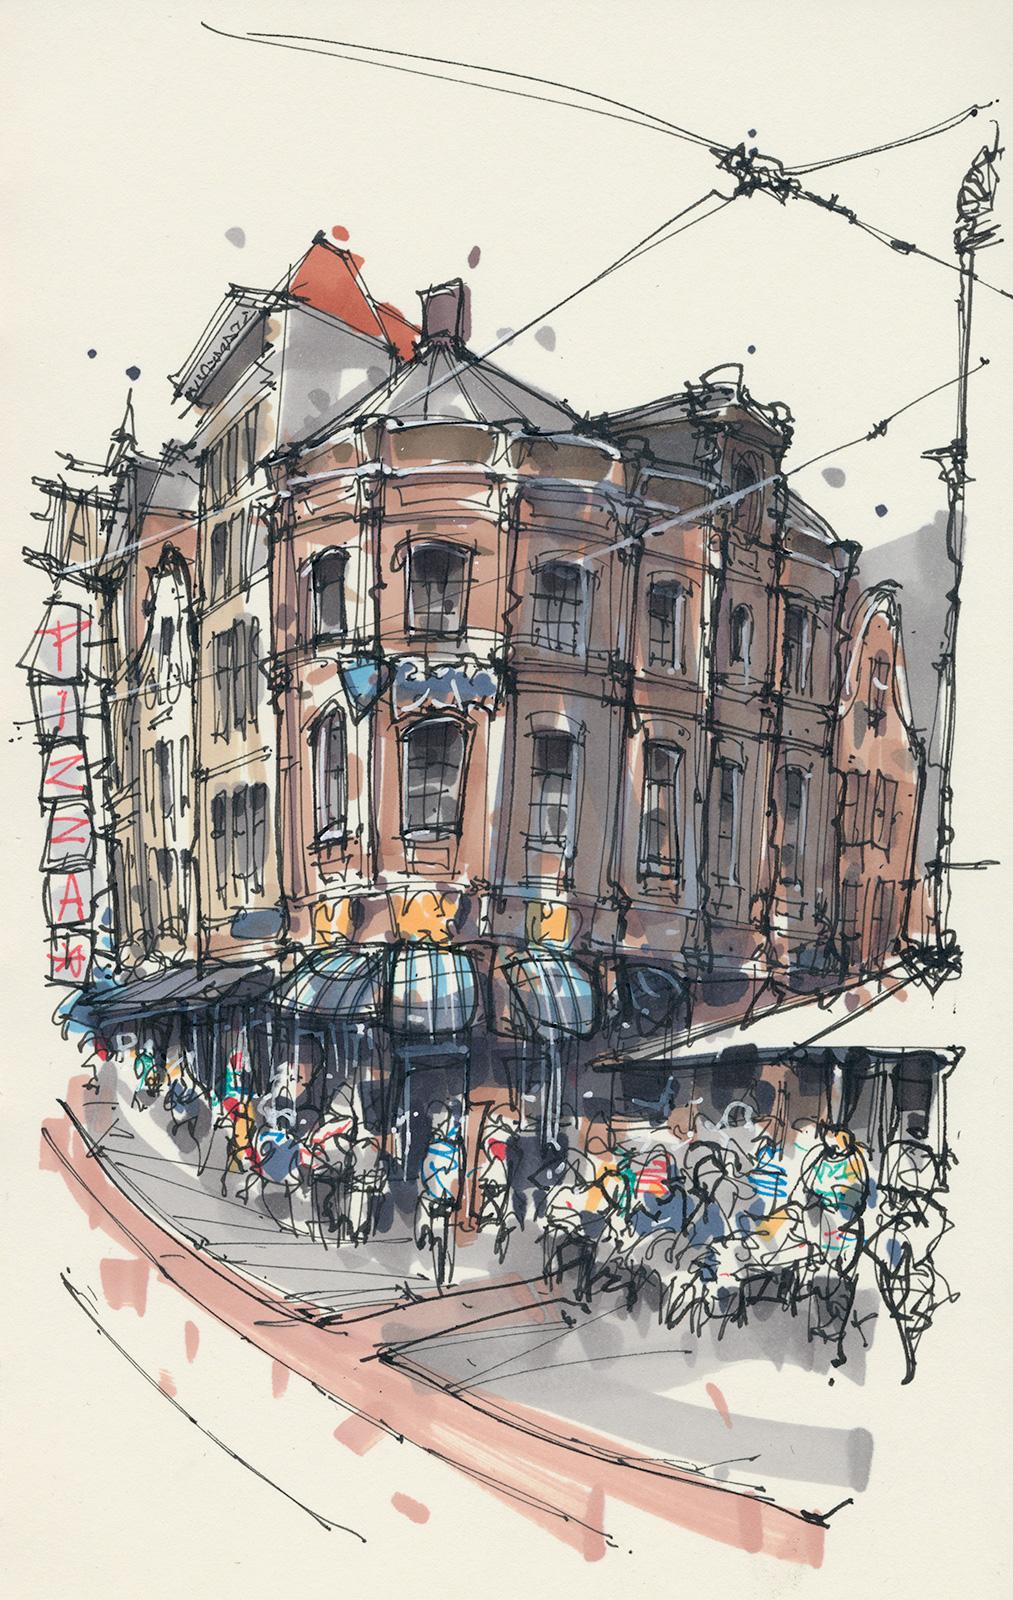 Reguliersbreestraat, Amsterdam